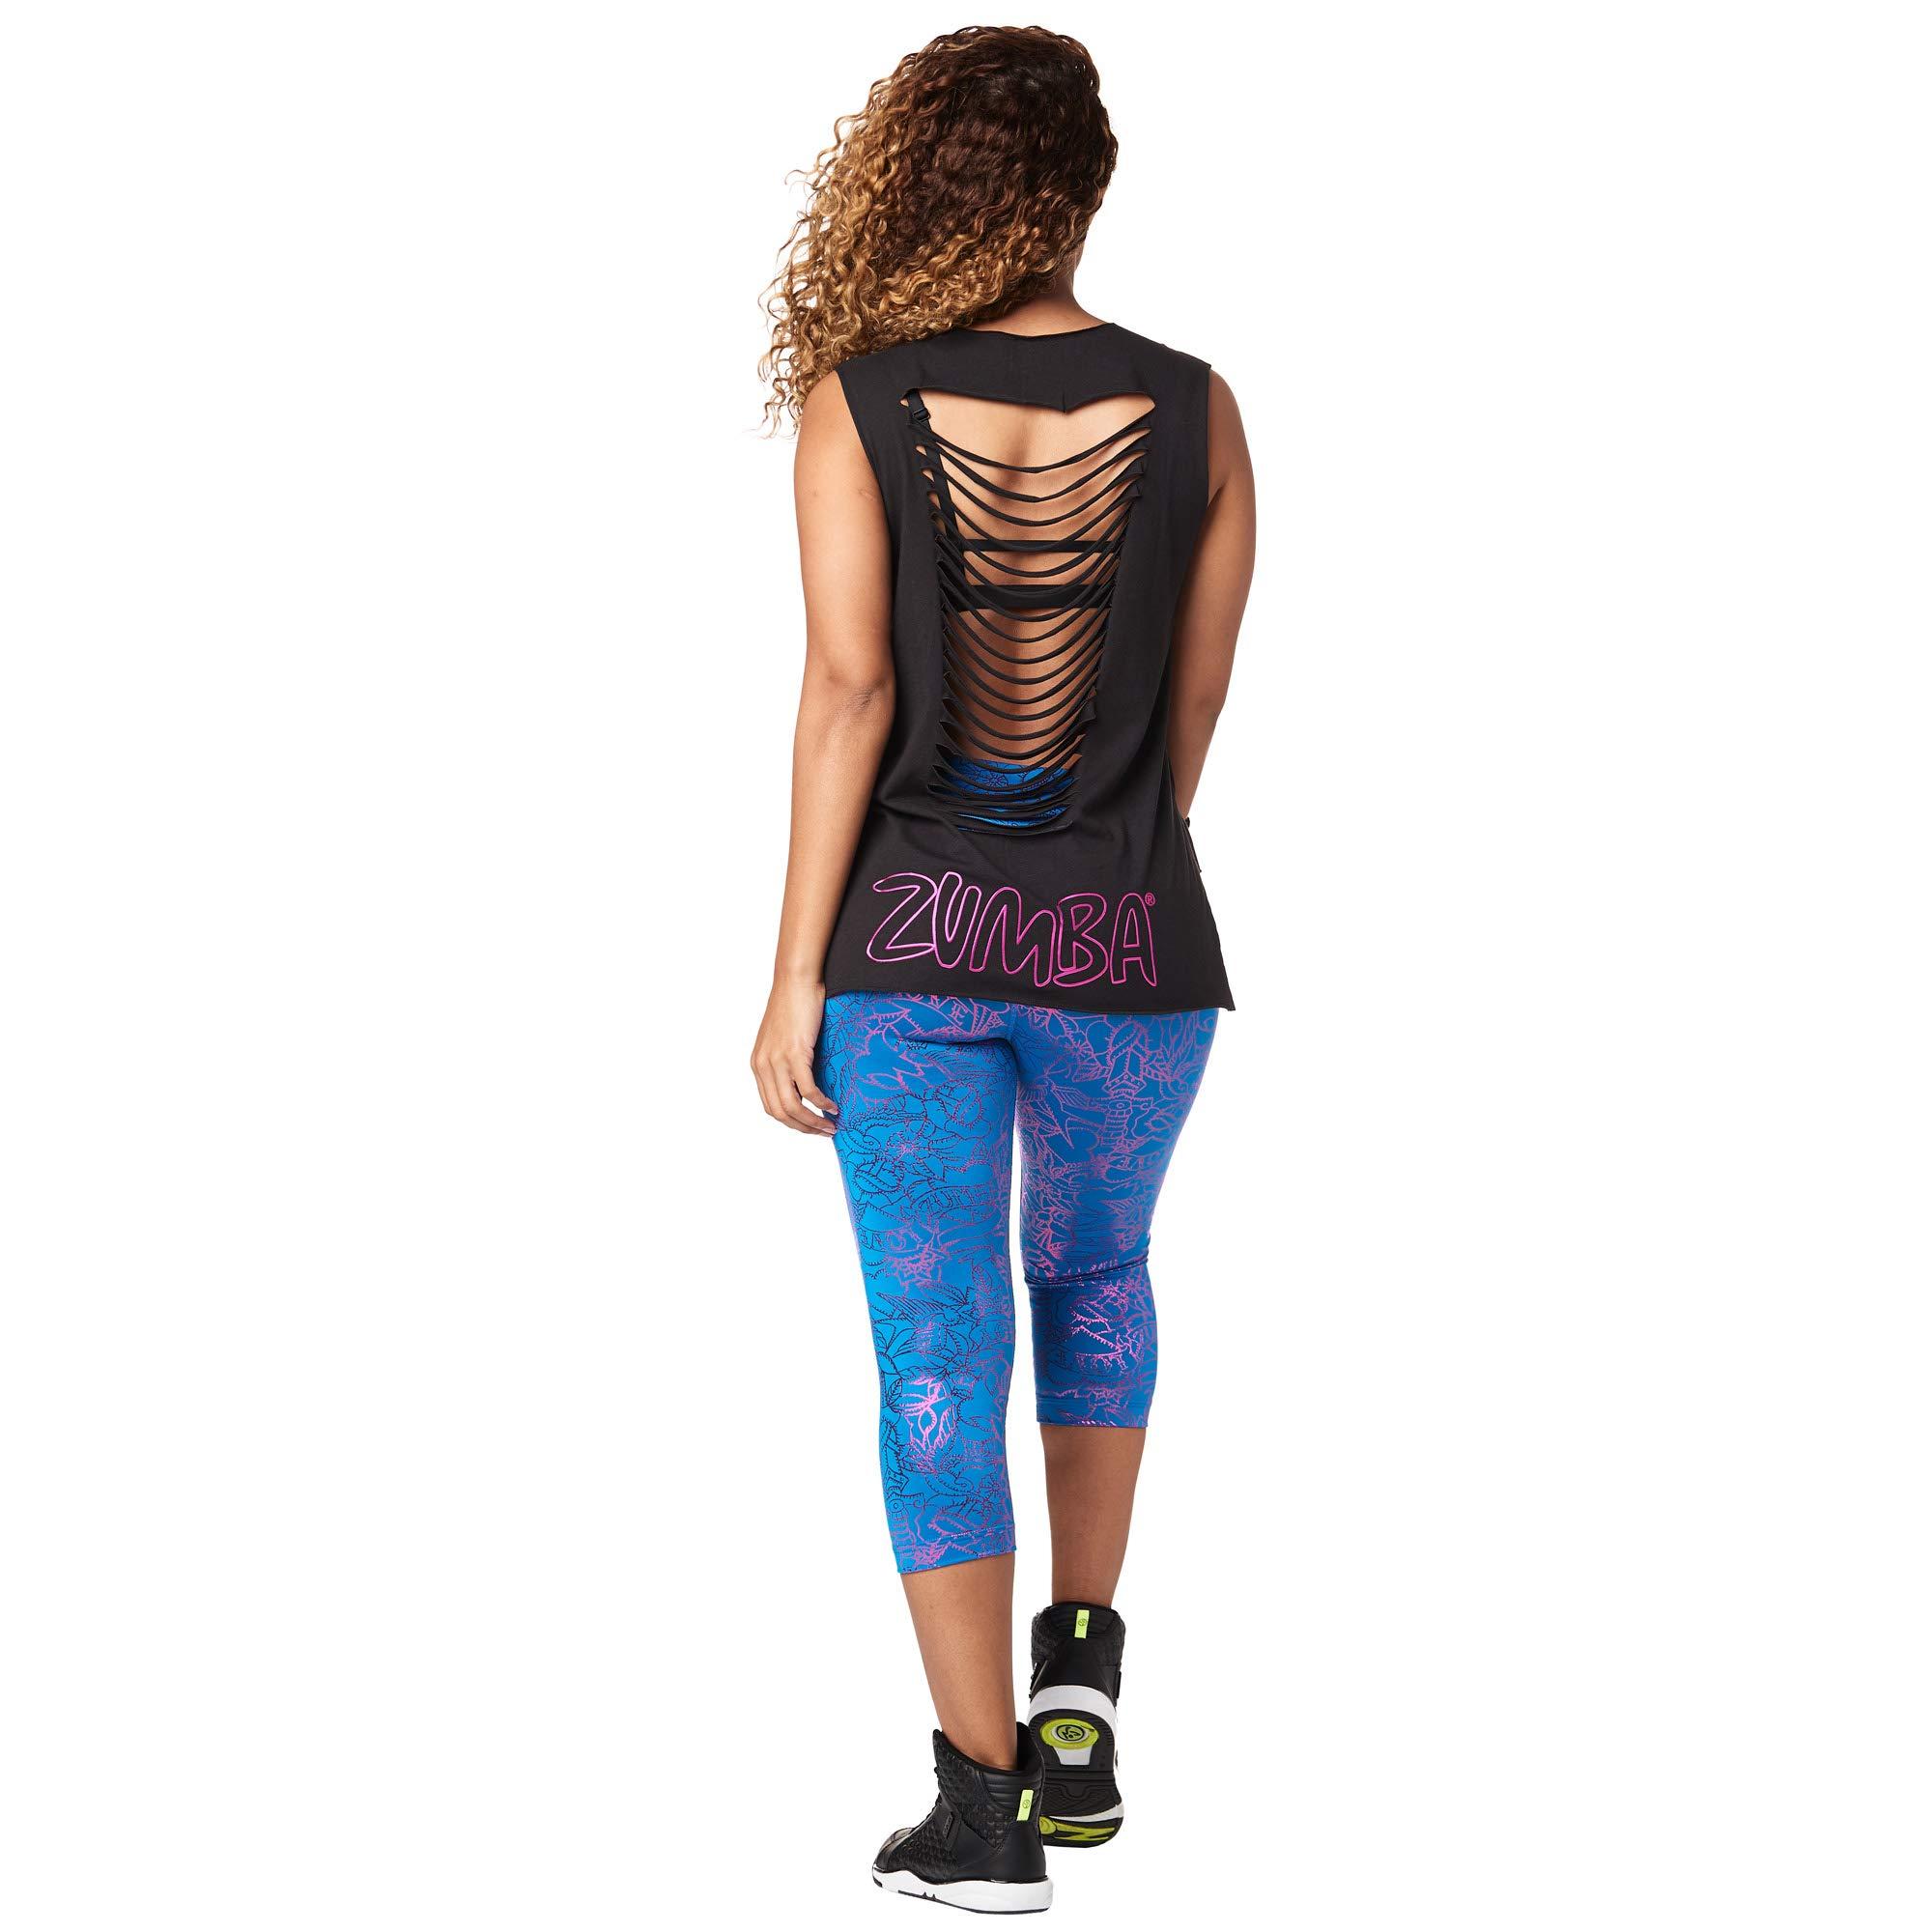 Zumba Womens Longsleeve Breathable Mesh with Fashion Print